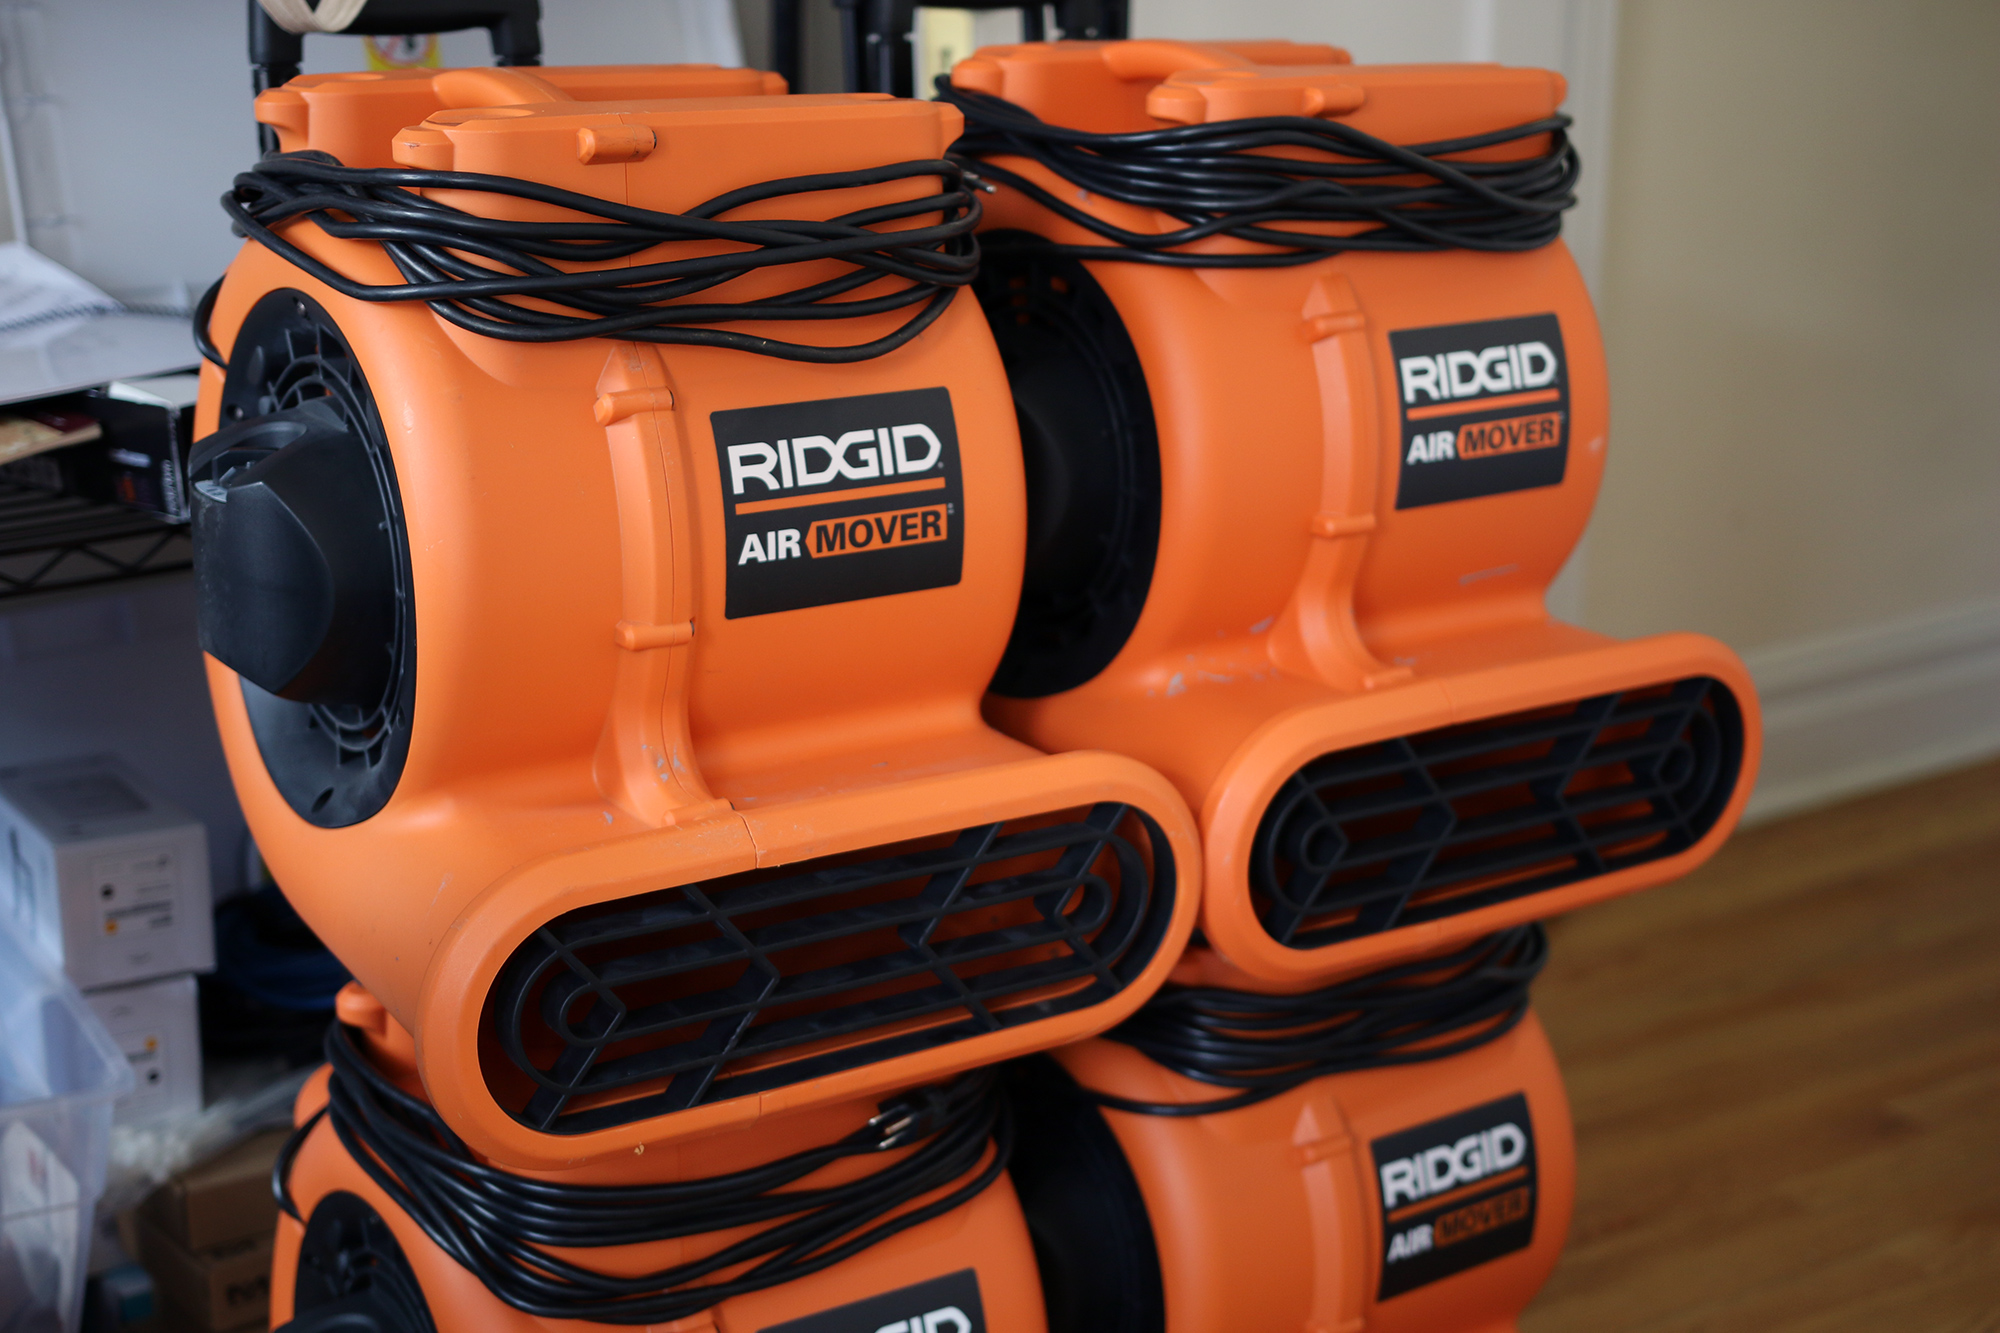 An orange-colored Ridgid Air Mover